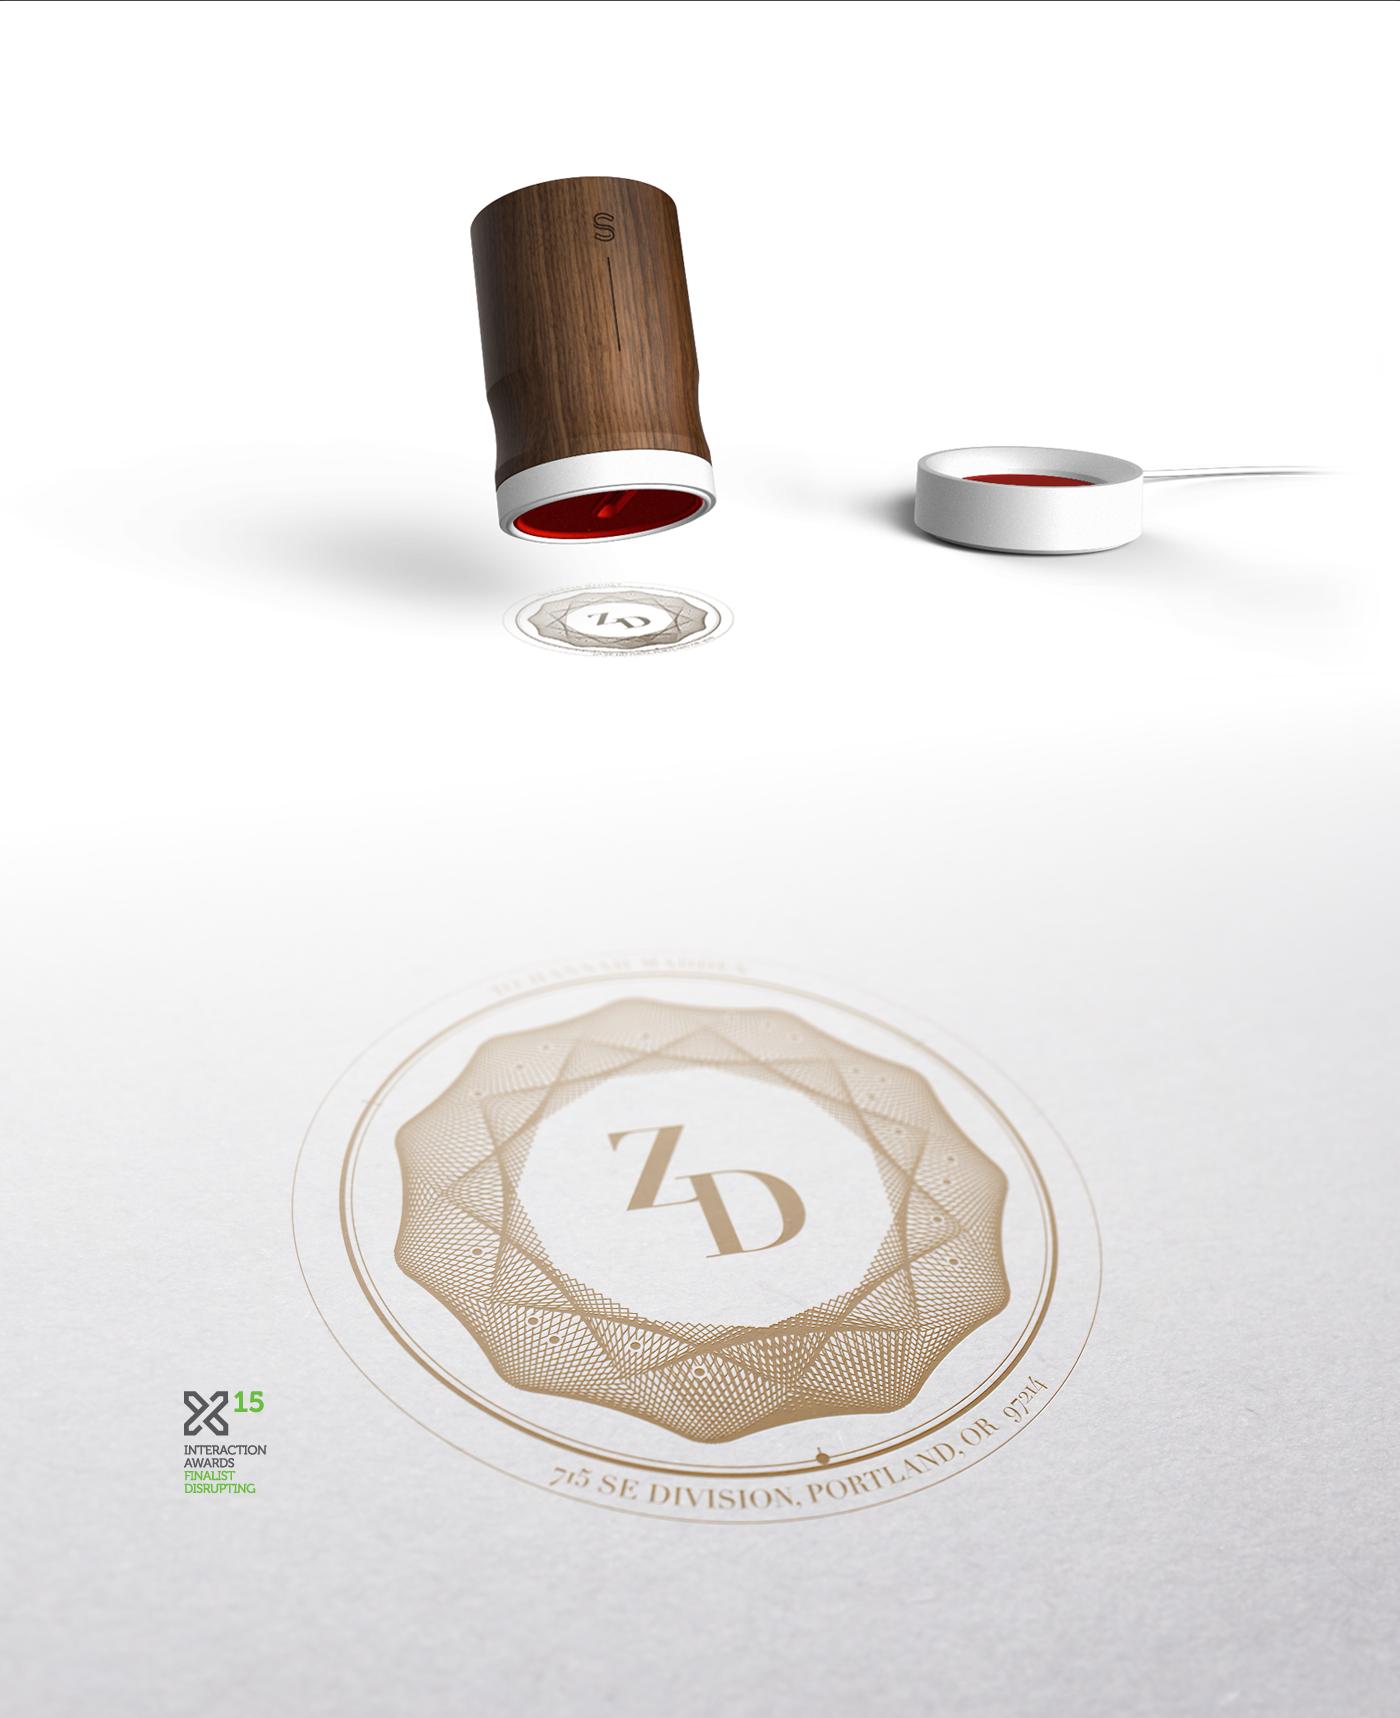 design UI ux service Signet shipping IoT innovation DISRUPTION future concept storytelling   ixda award